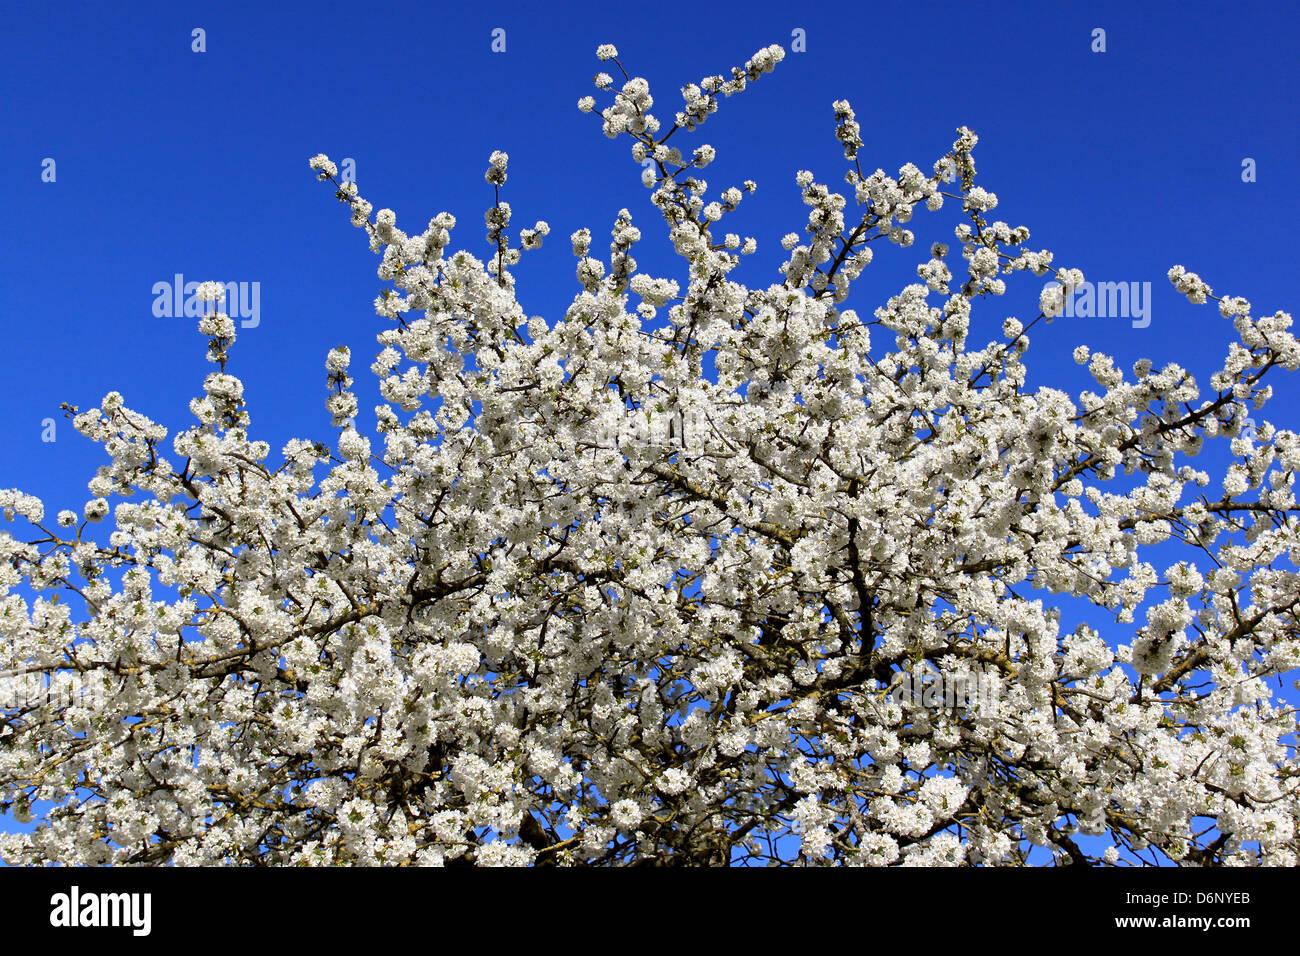 Albero Con Fiori Bianchi burlat cherry stock photos & burlat cherry stock images - alamy